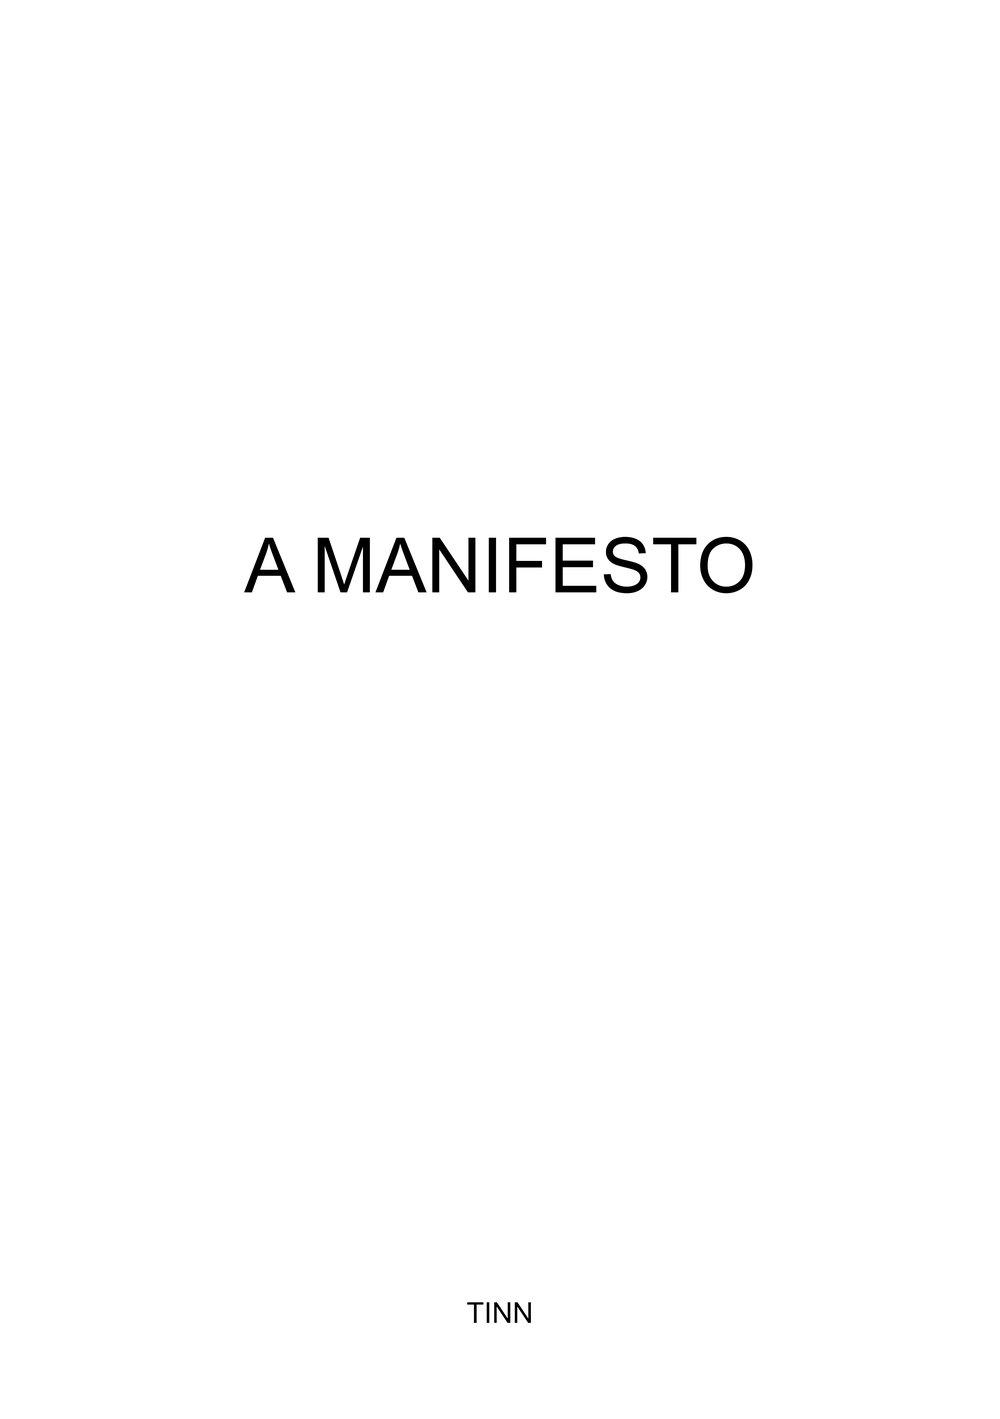 Manifesto Layout3.jpg